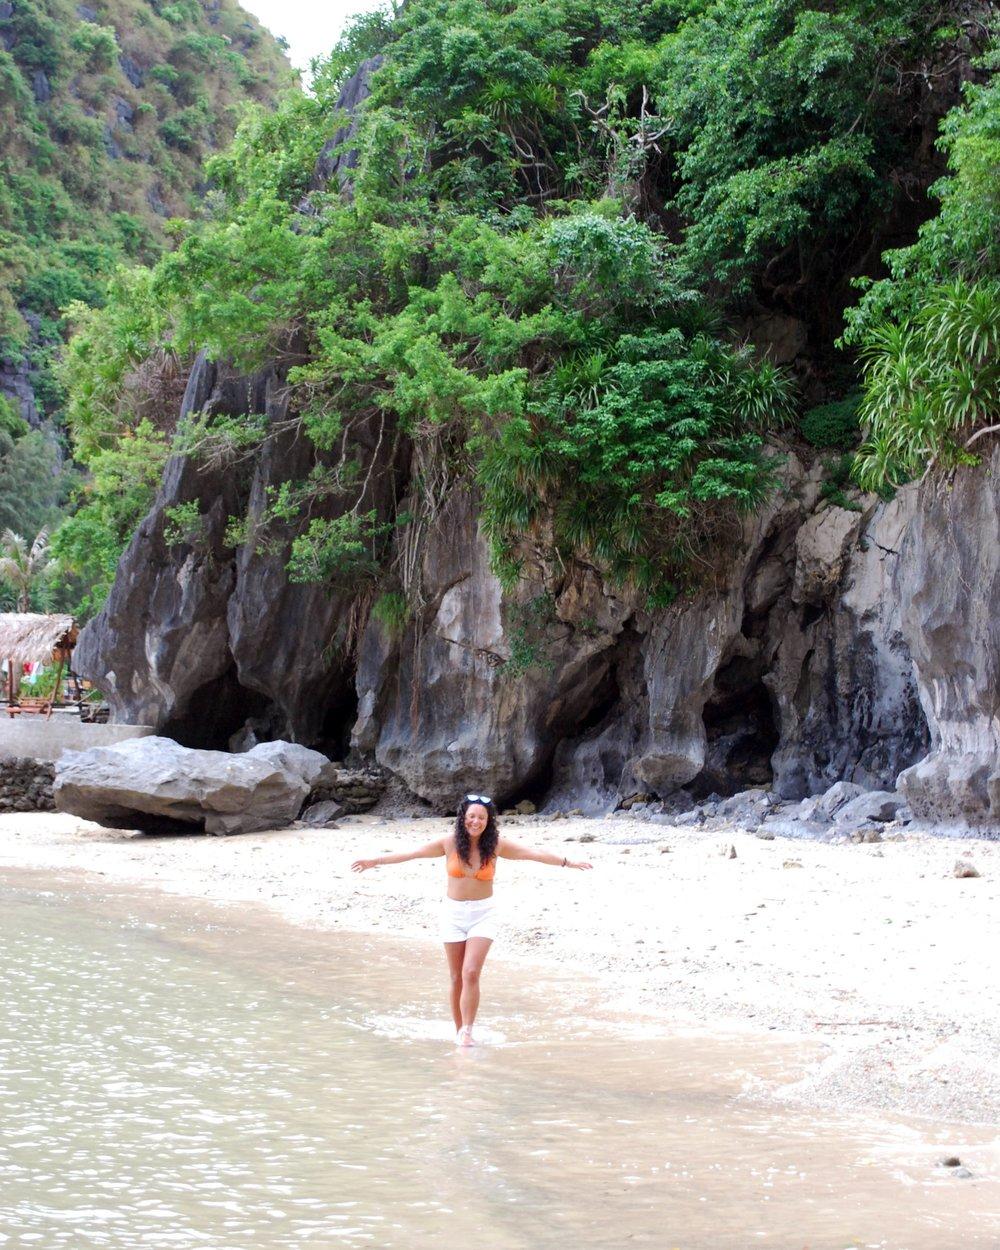 Free as a bird on Freedom Island, Halong Bay, Vietnam